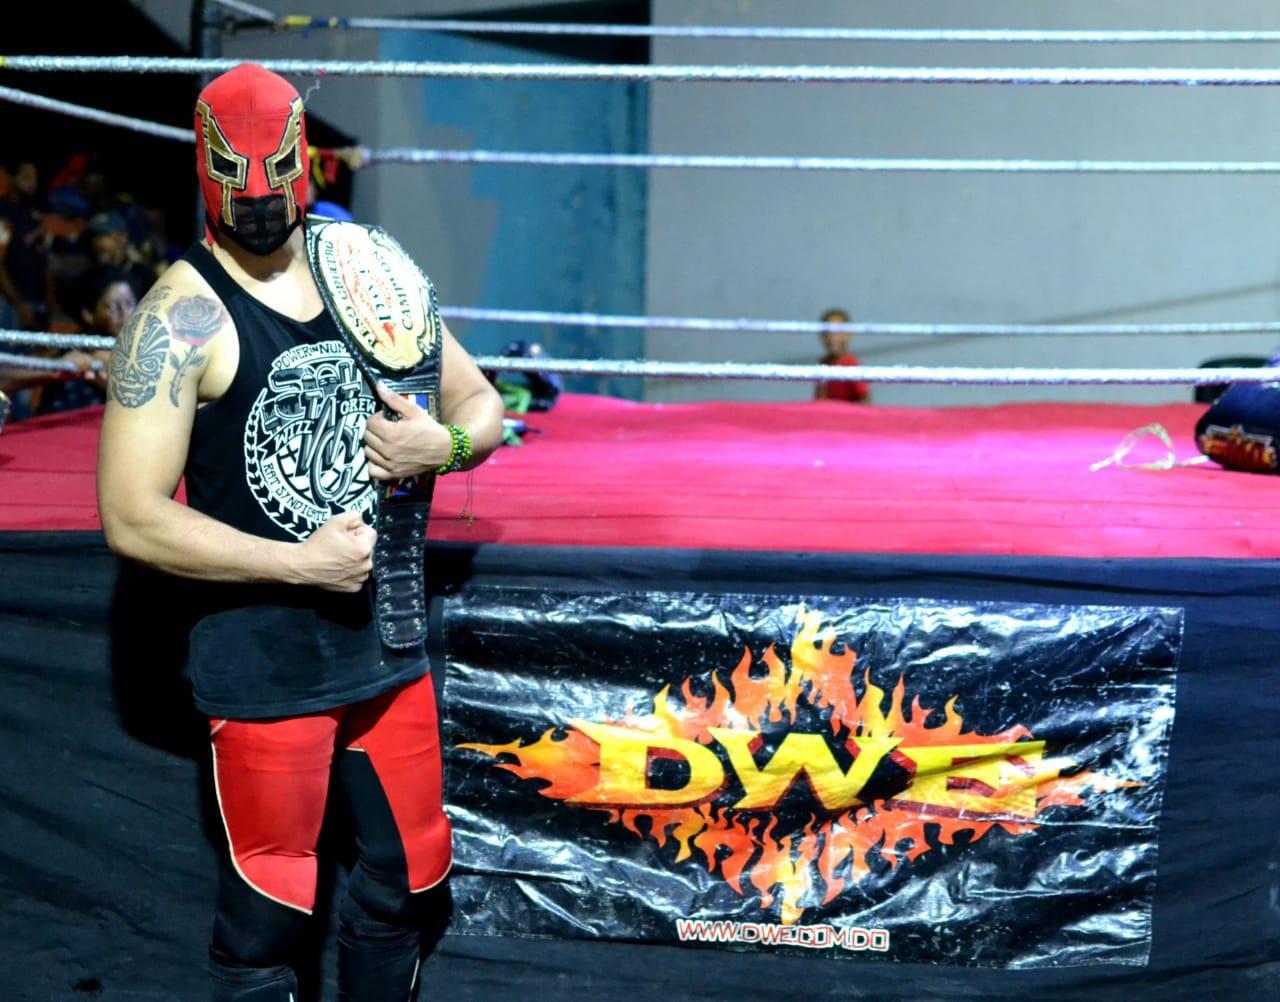 El Rey Kaoz, estrella de la lucha libre dominicana.